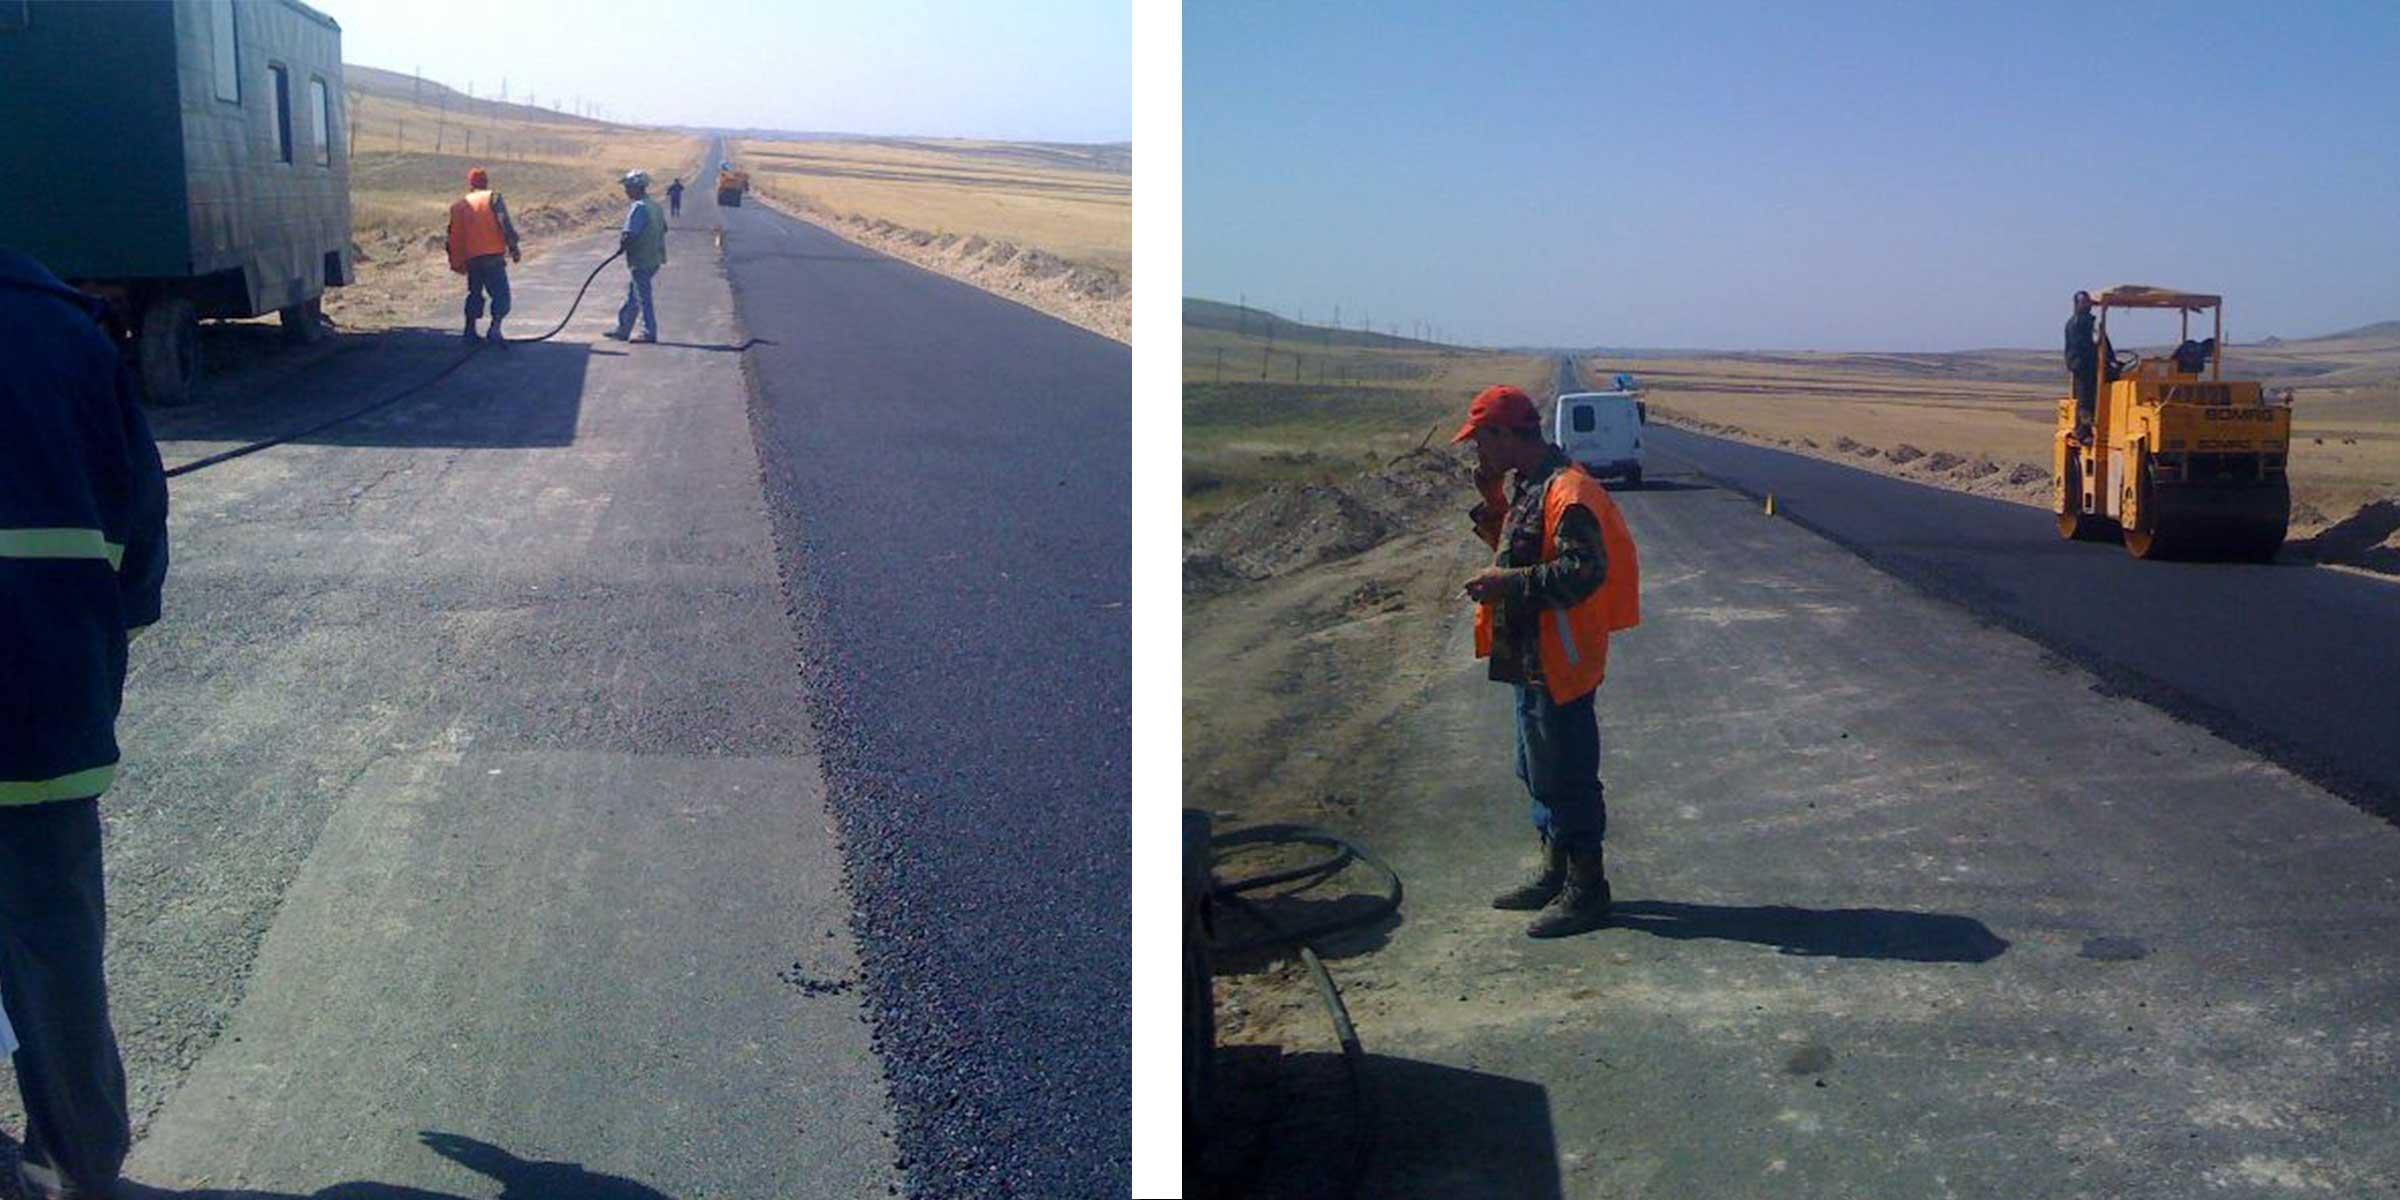 Workers improving roads in Armenia.